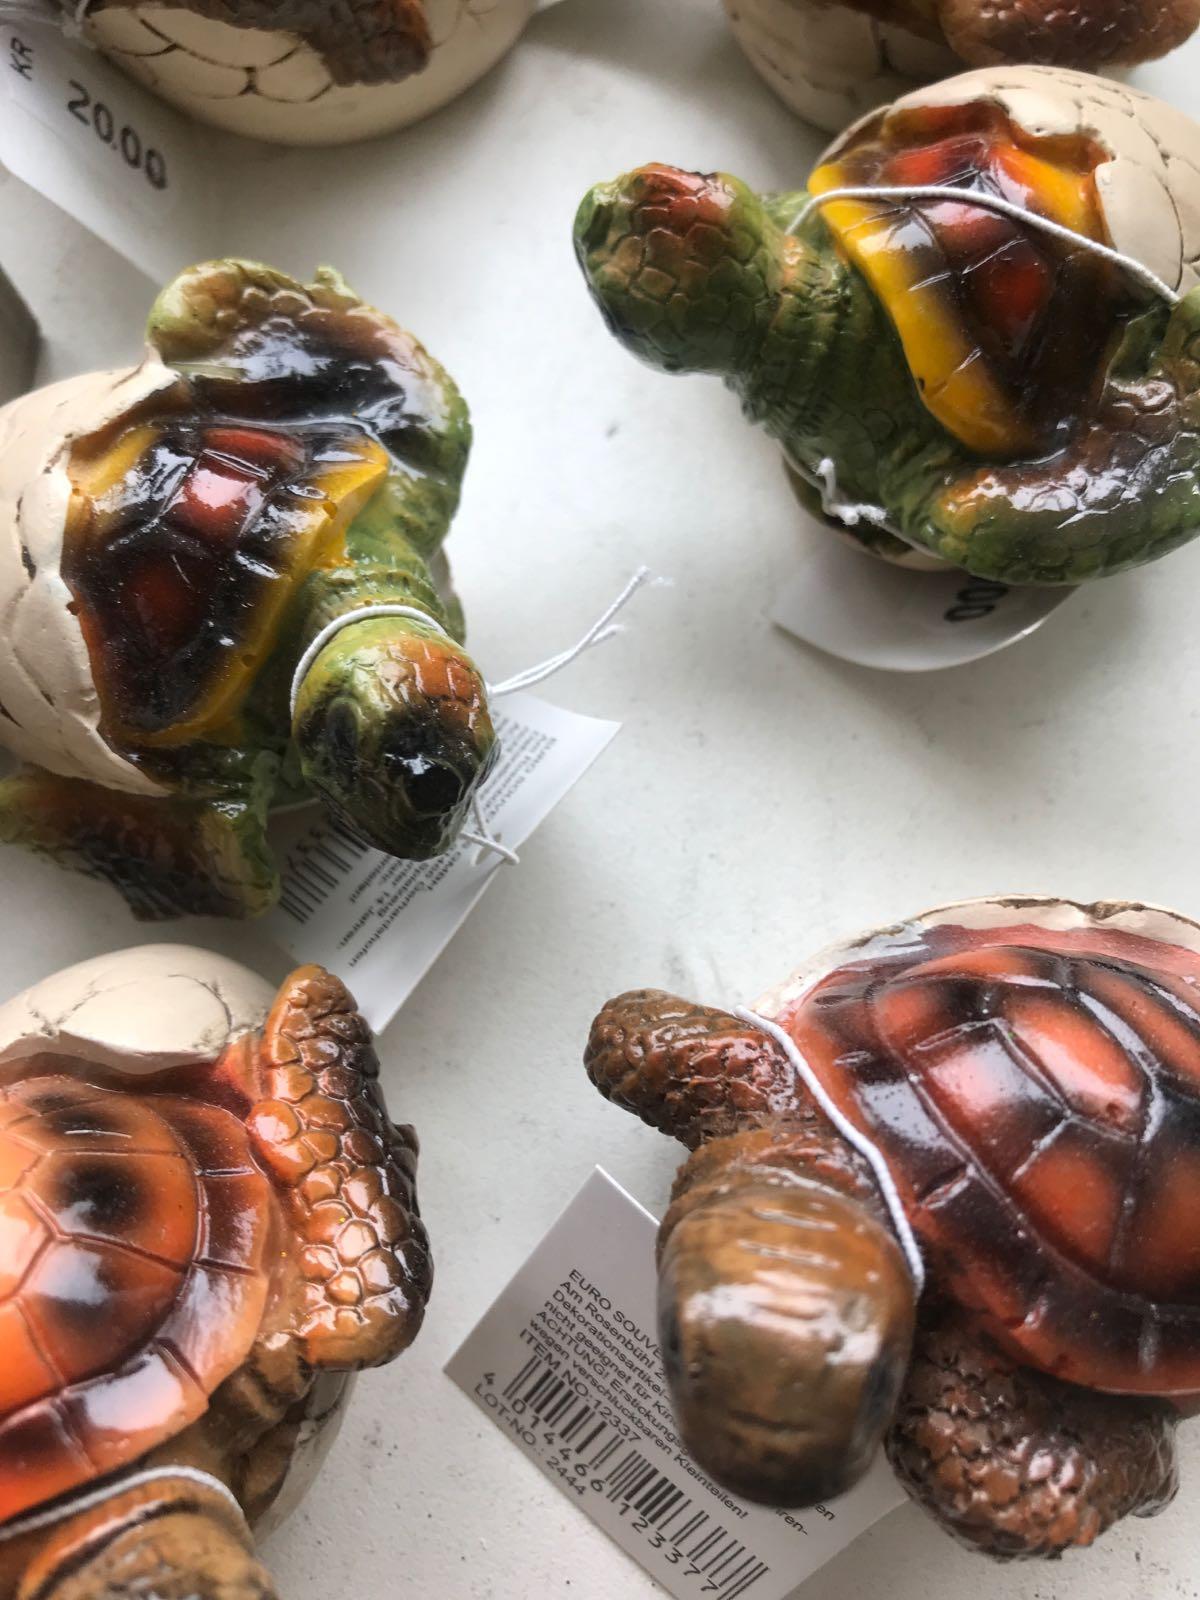 Prydnad sköldpadda